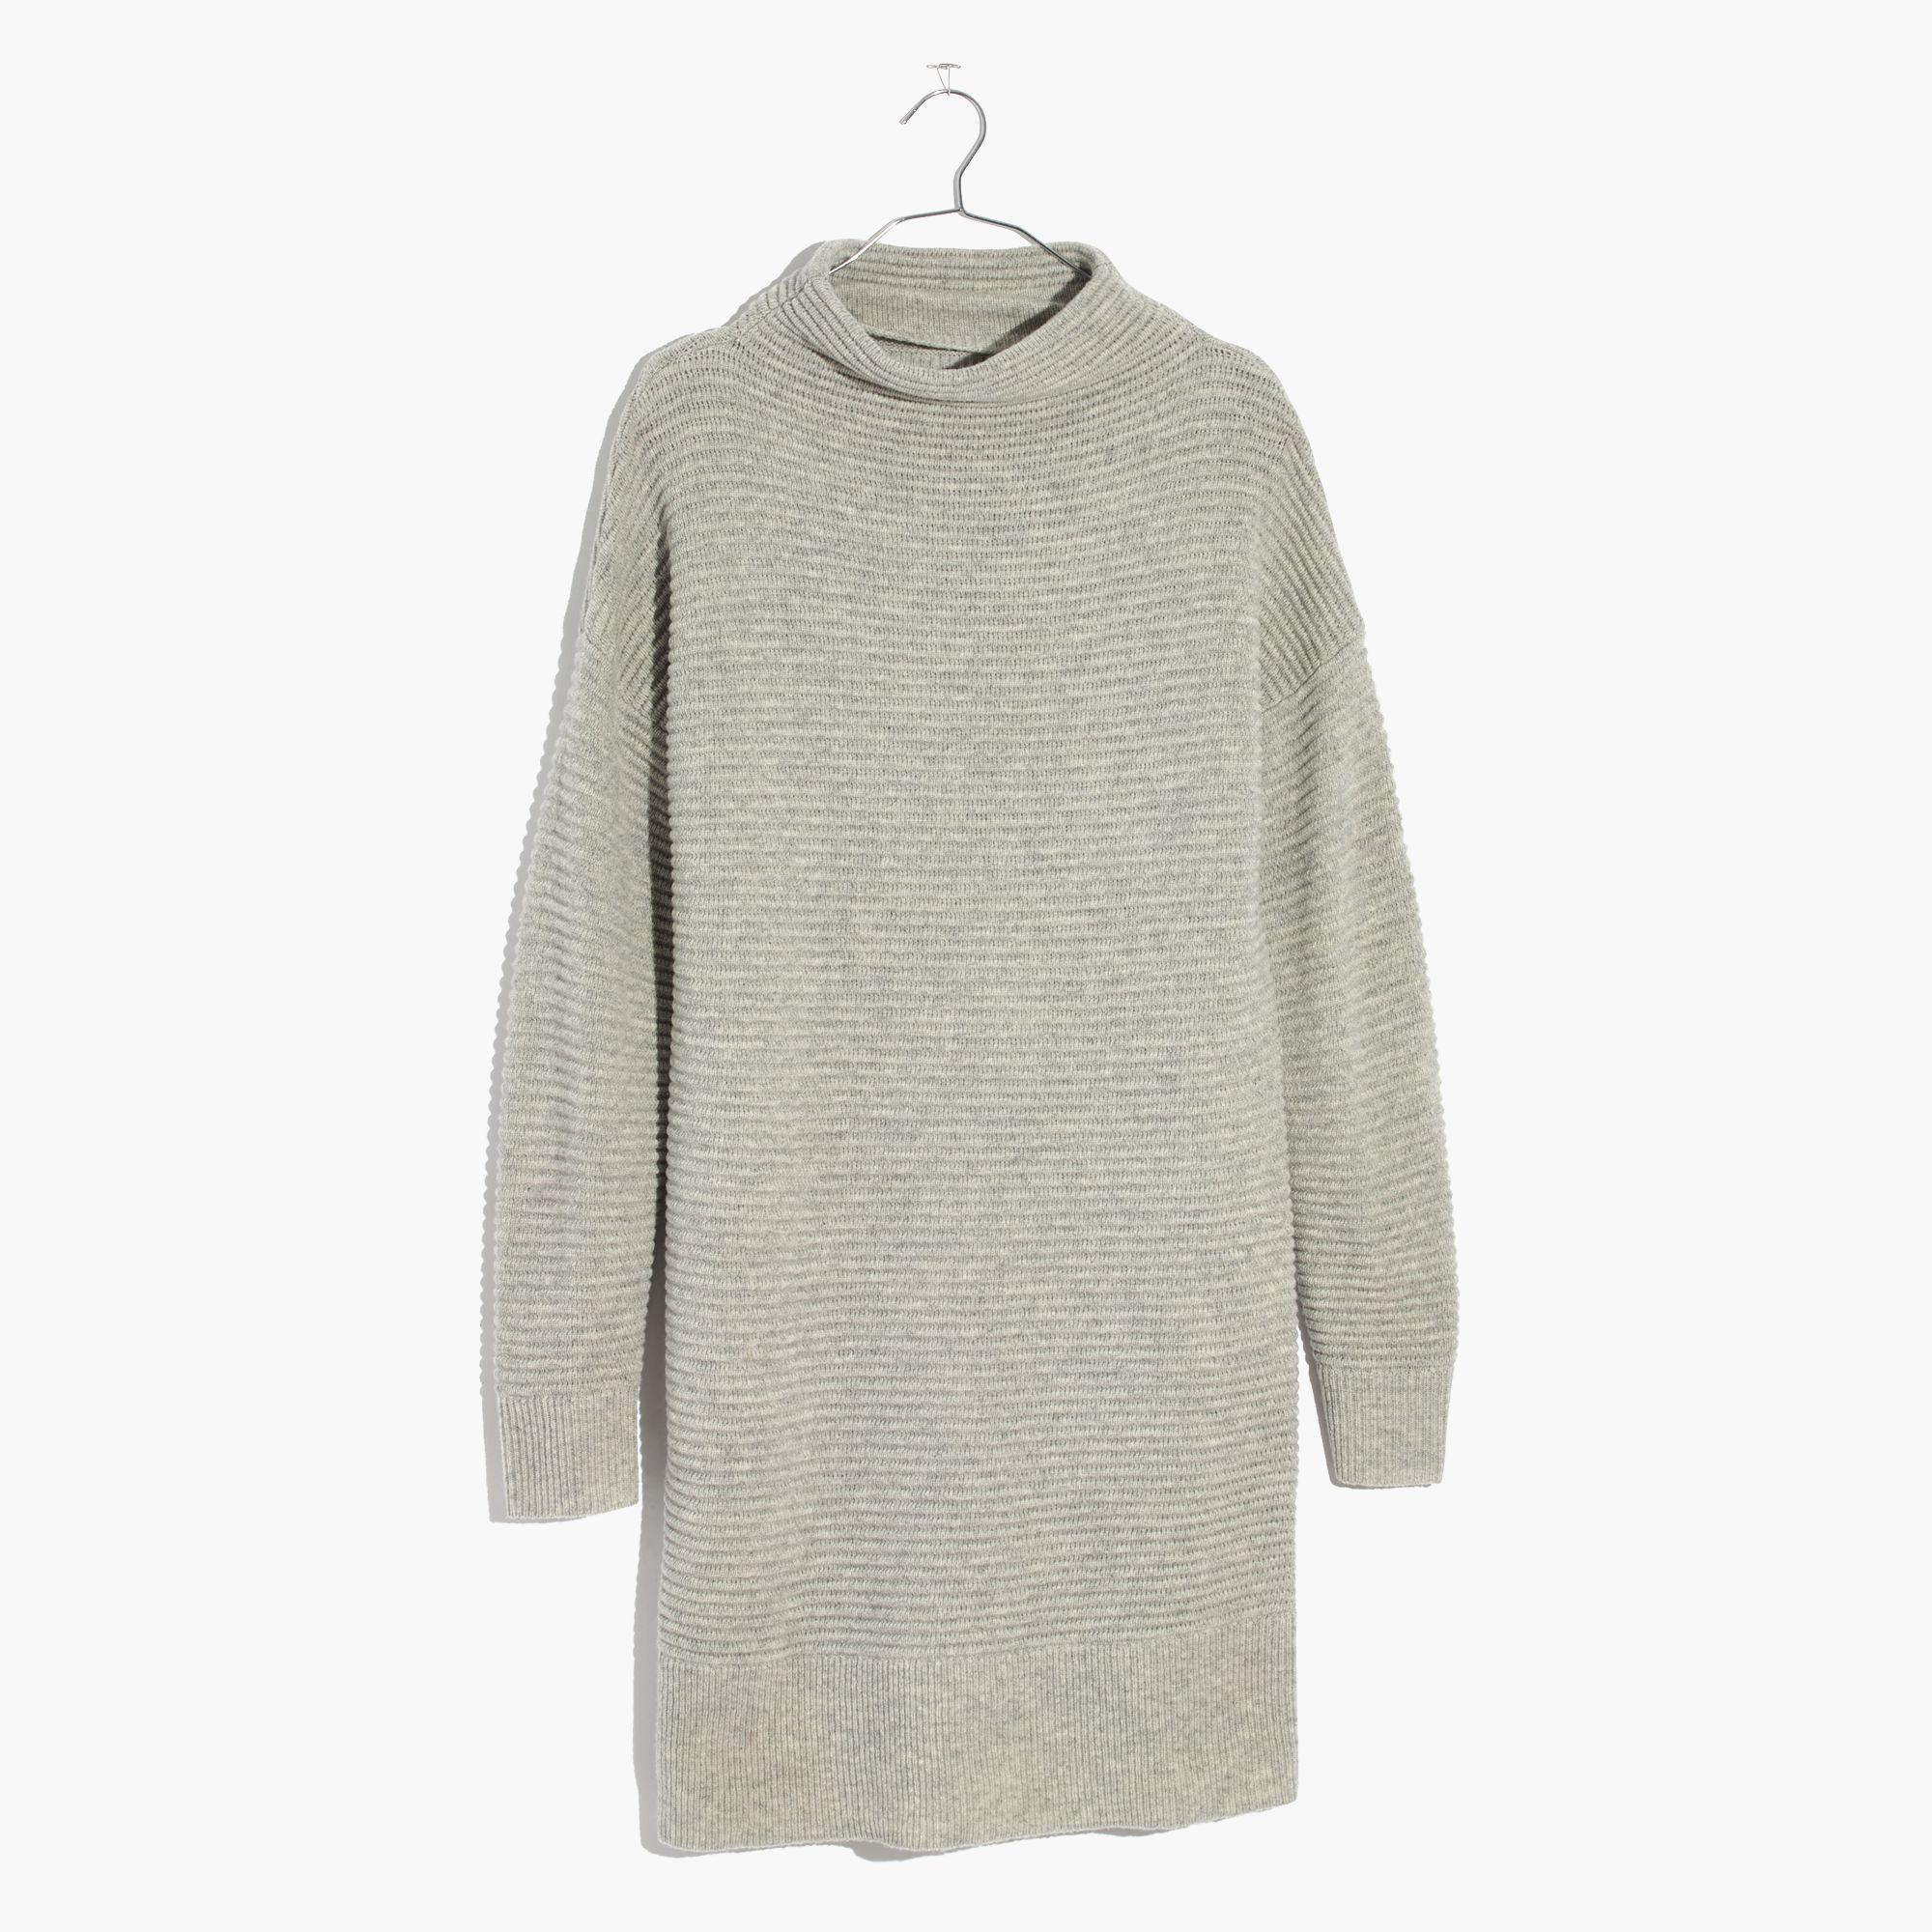 6480d926604 Madewell Skyscraper Sweater-dress in Gray - Lyst